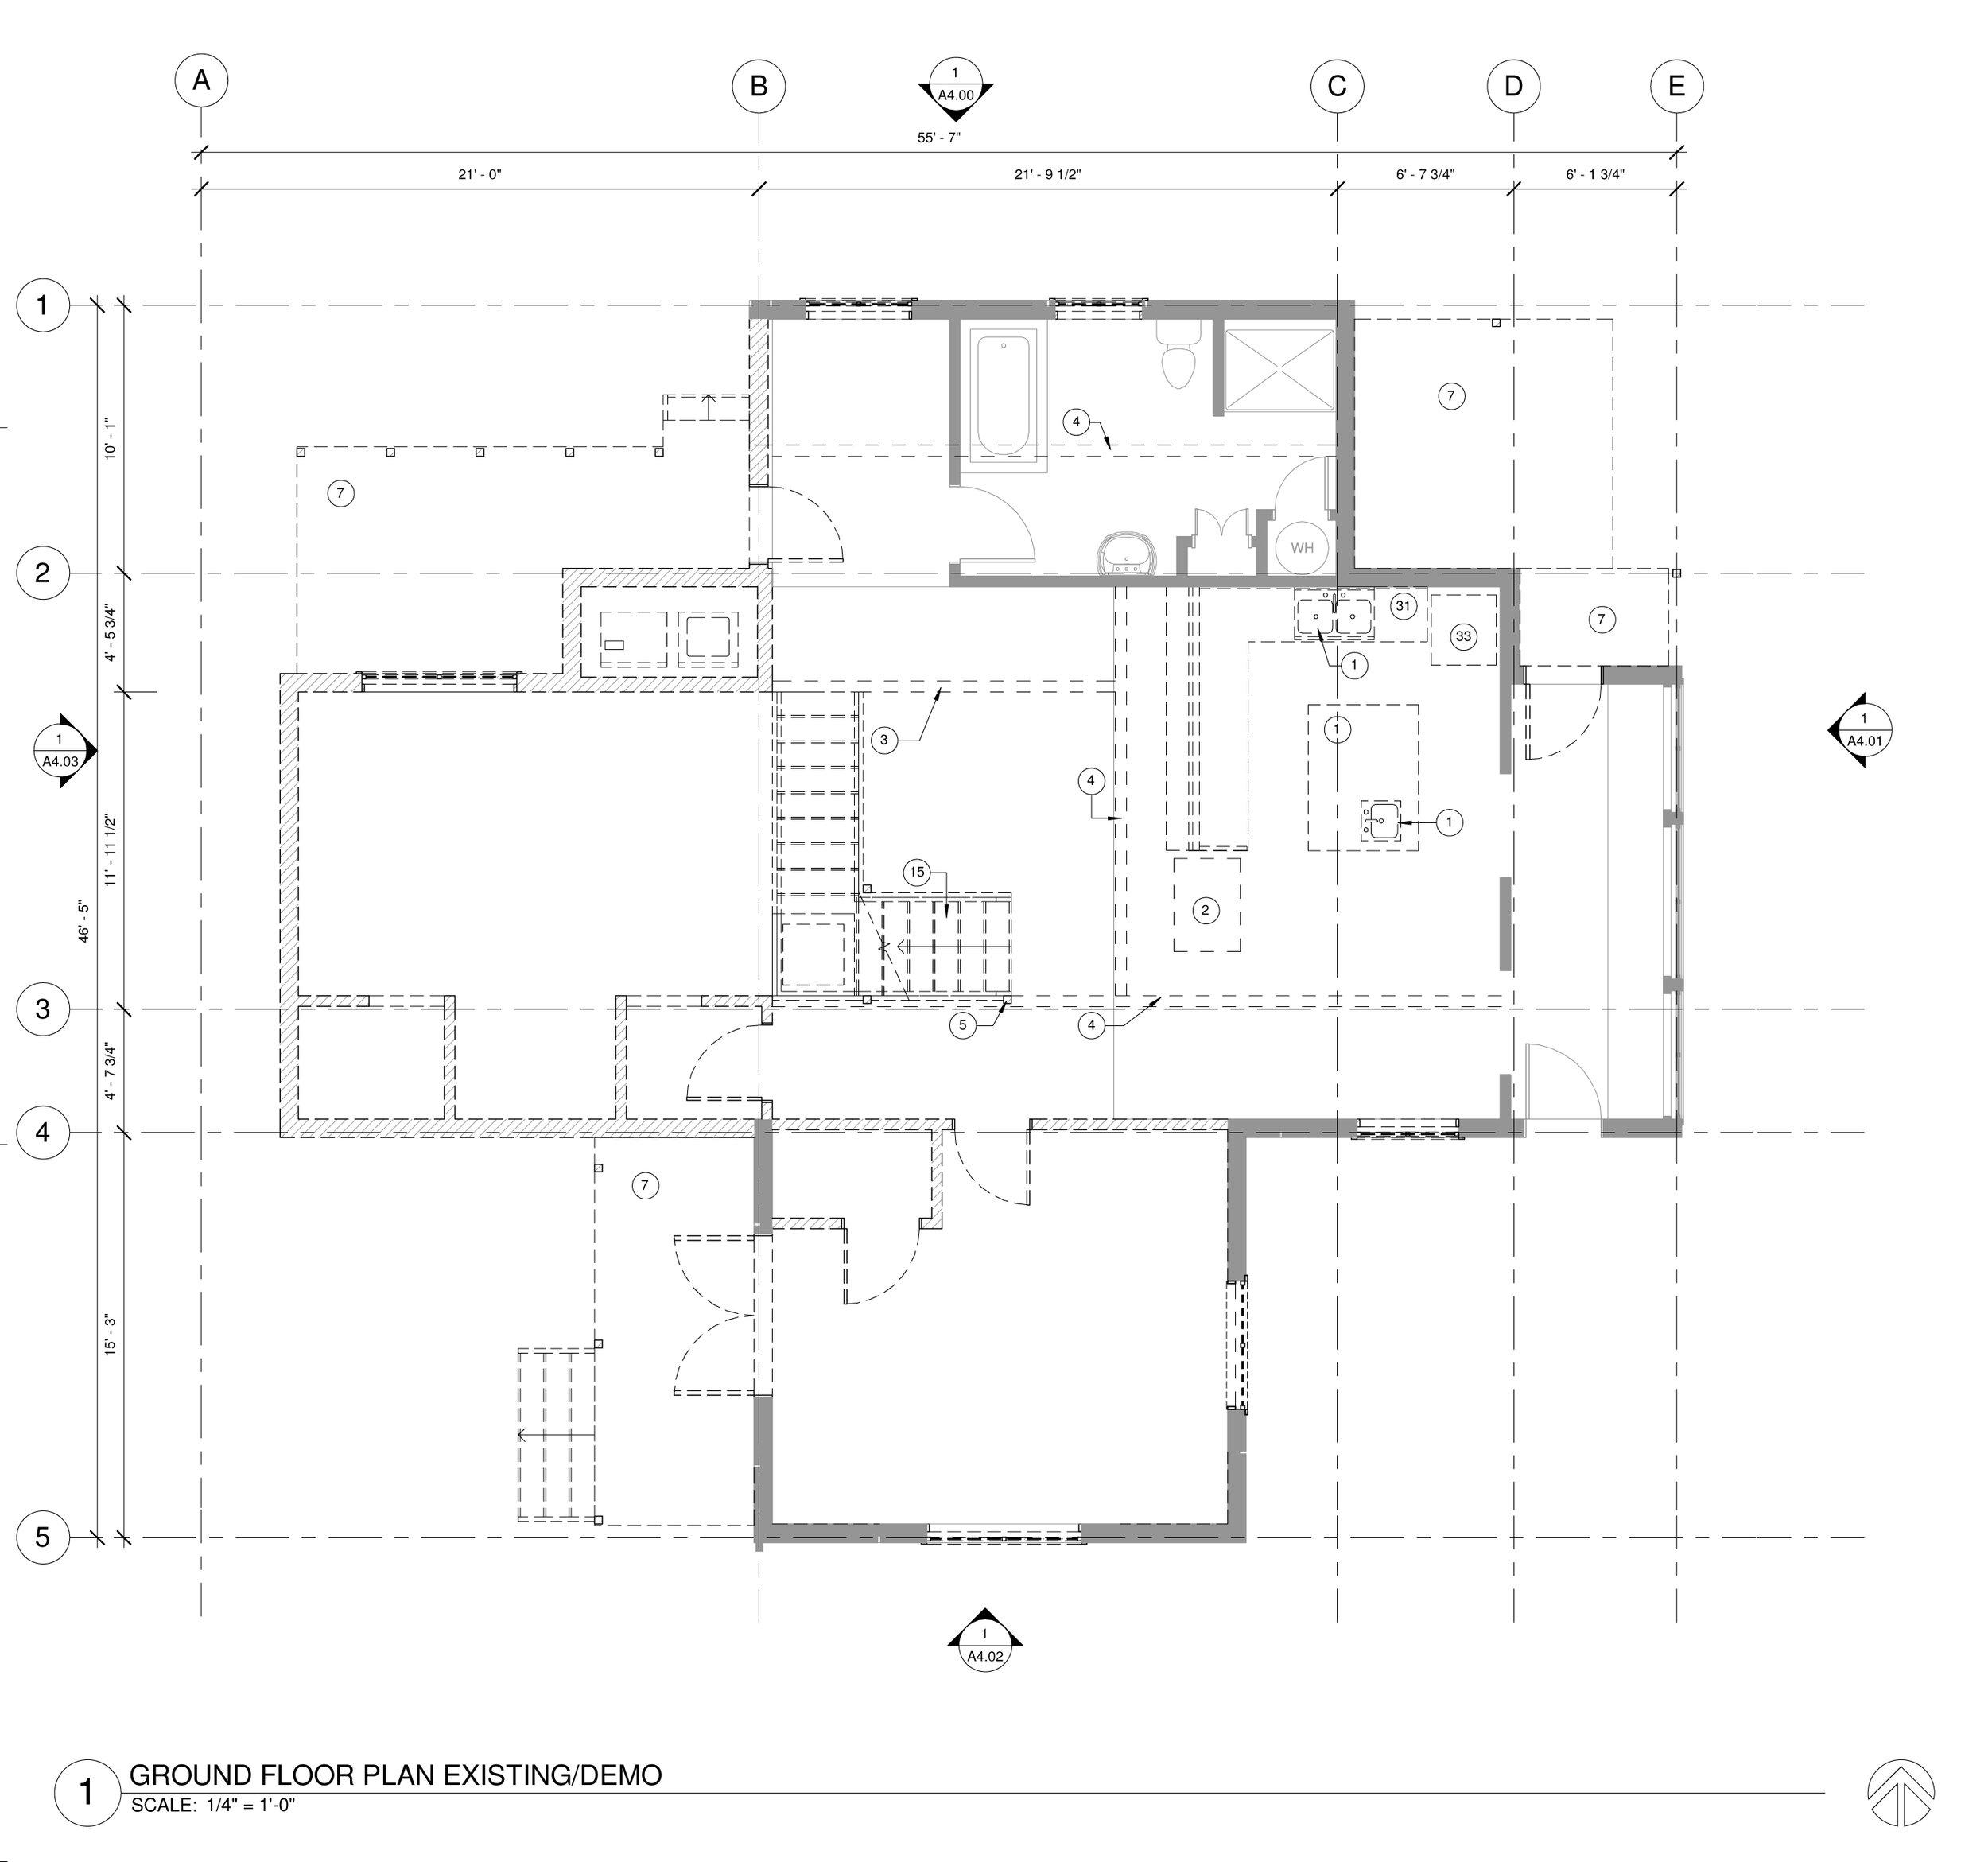 farmhouse drawings - ground floor demo.jpg